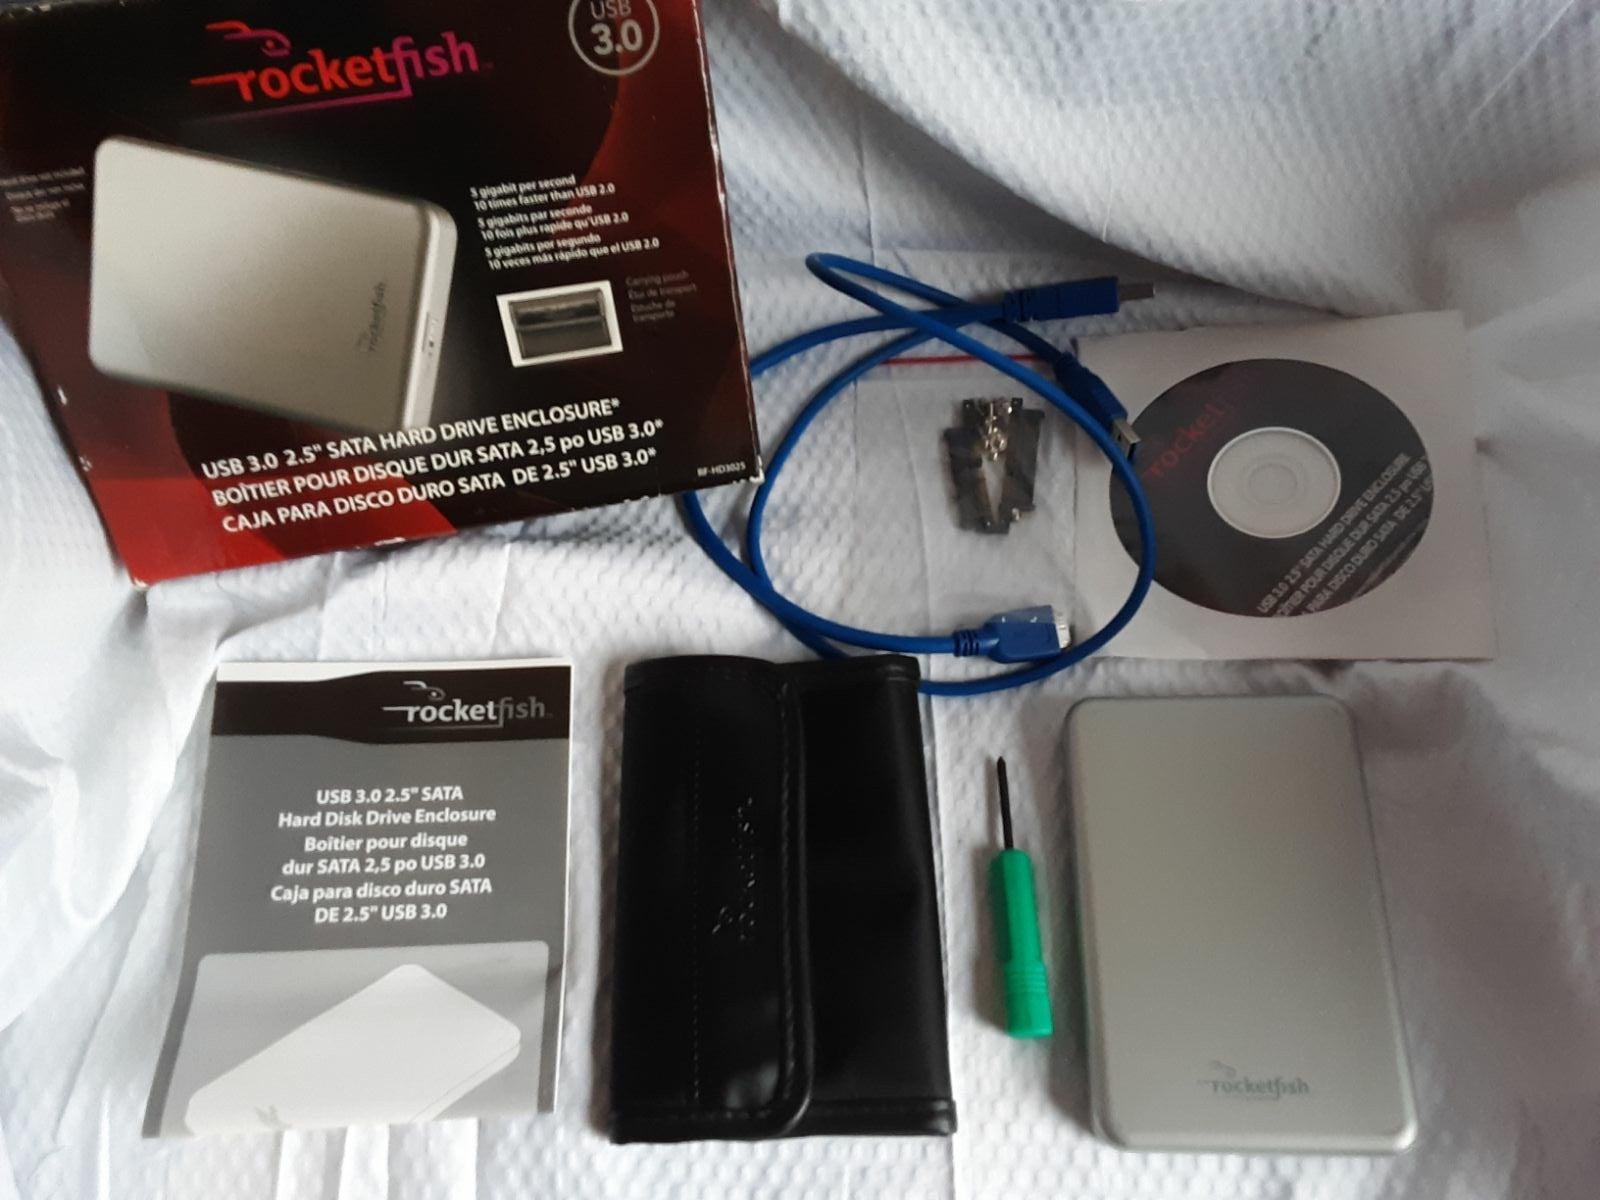 Rocketfish USB 3.0 2.5 SATA HD Enclosure